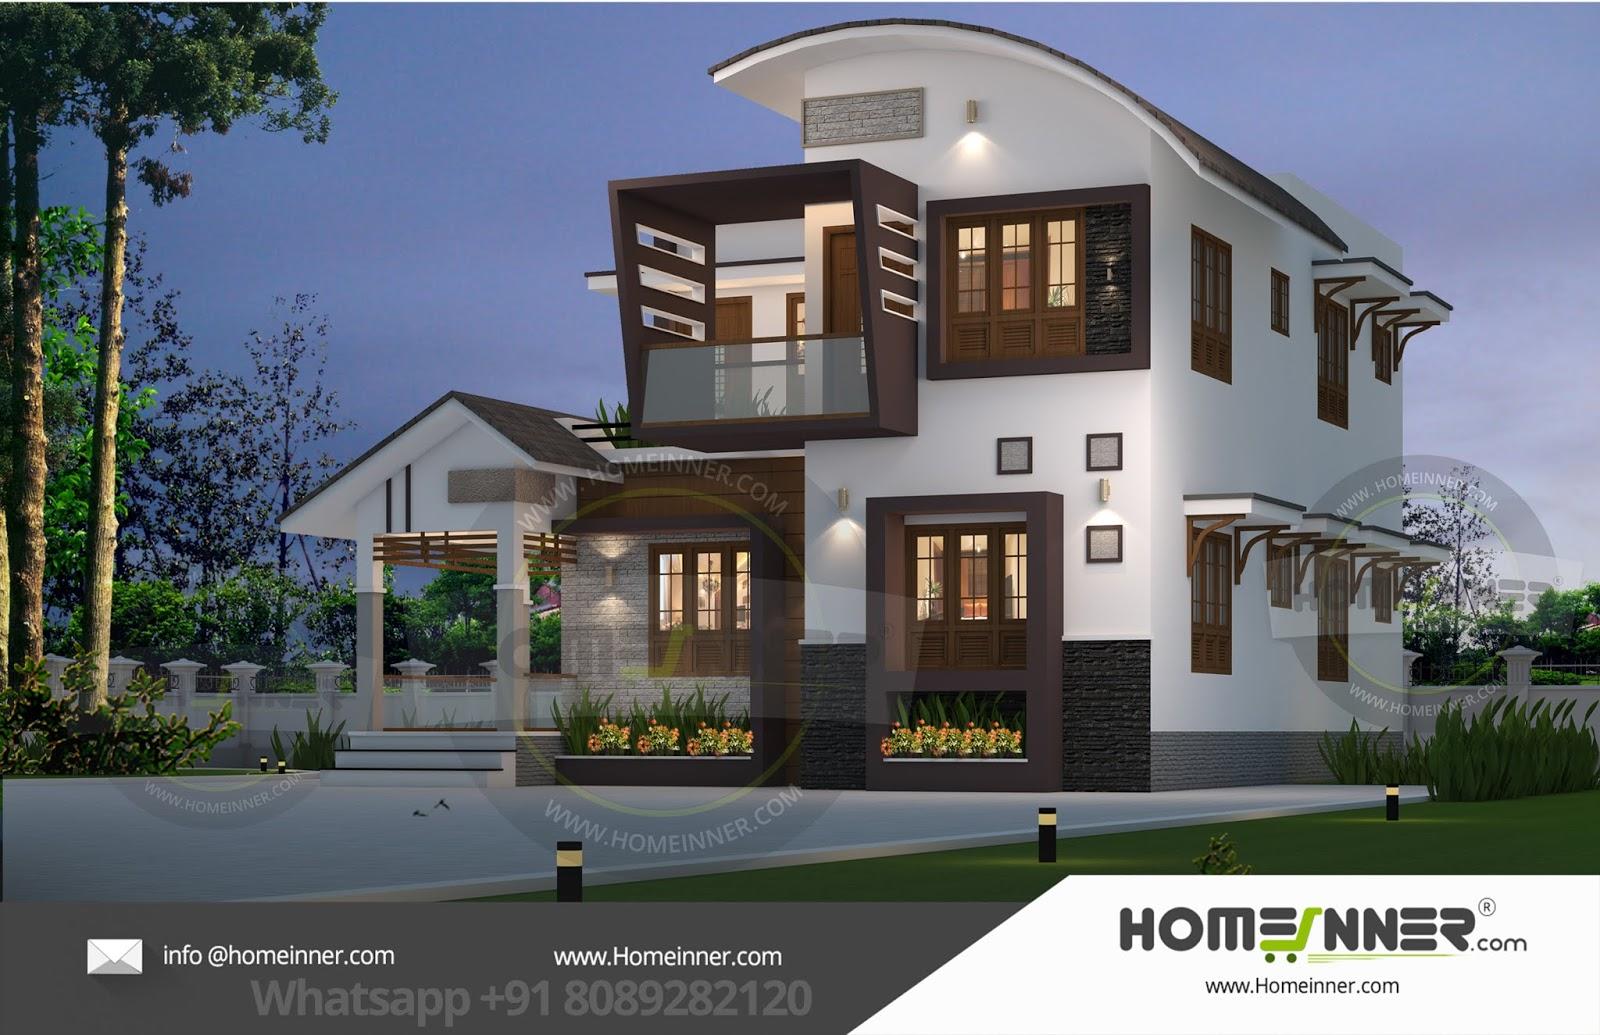 23 Lakh 3 BHK 1614 sq ft Surat Villa